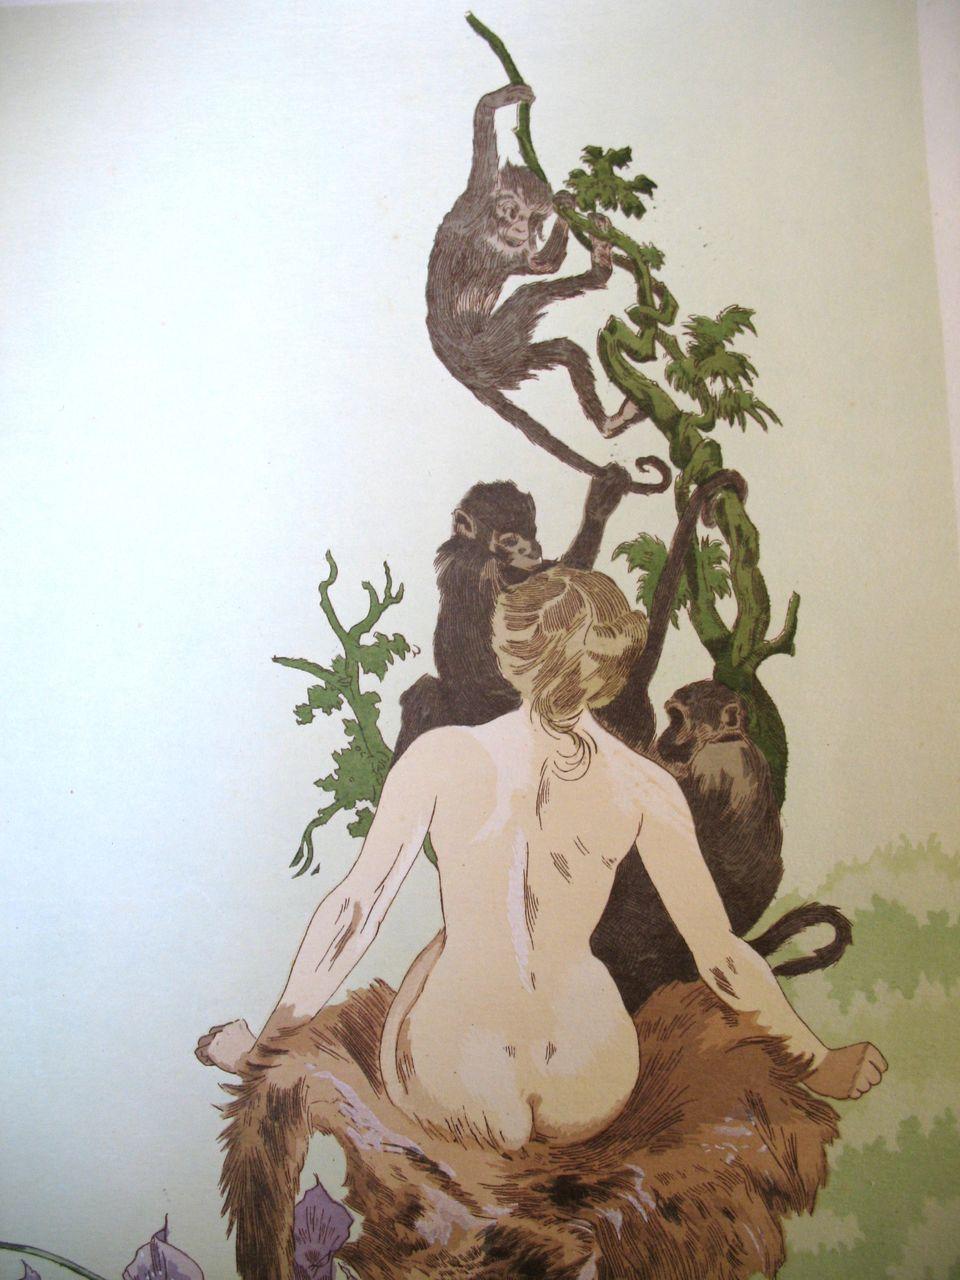 Antique French Art NOUVEAU Lithograph Print LISTED 7 SINS Lust Signed RARE!